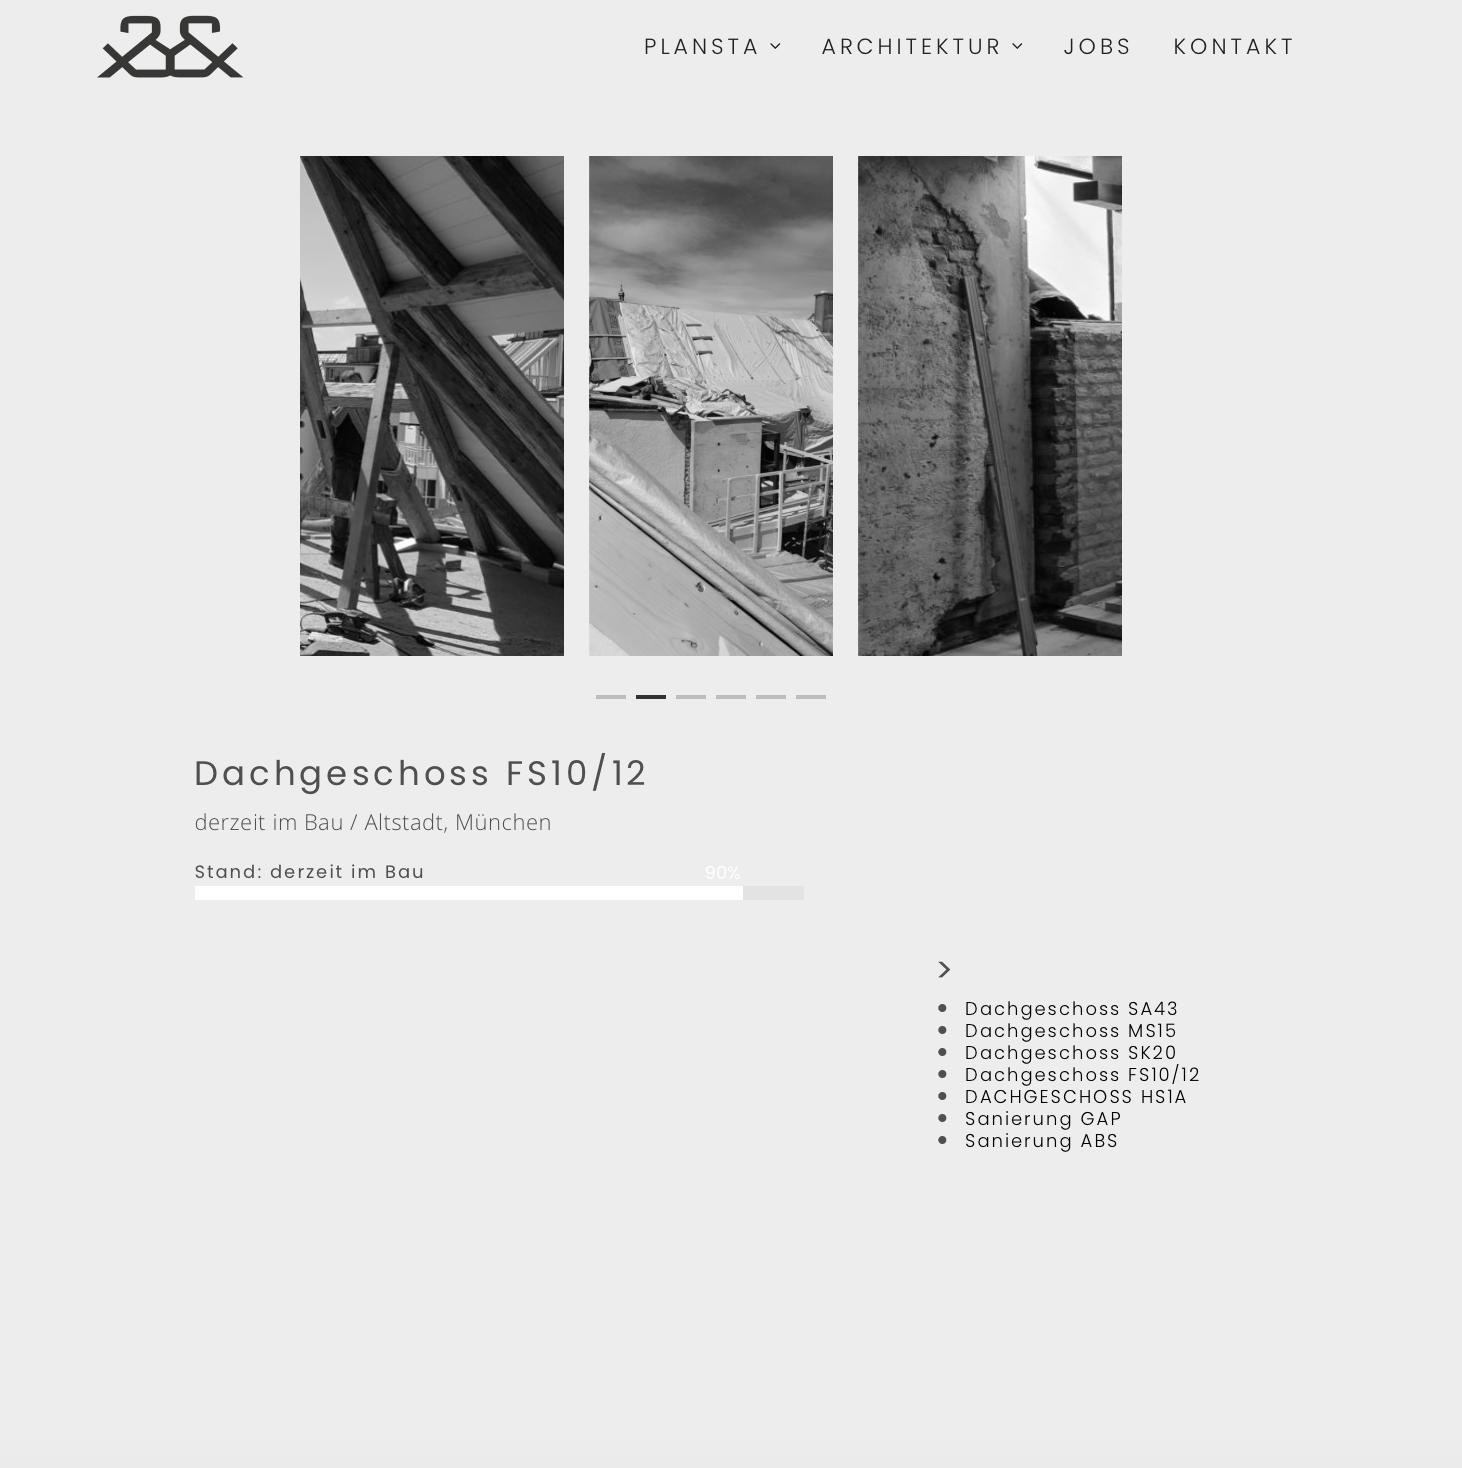 webdesign plansta